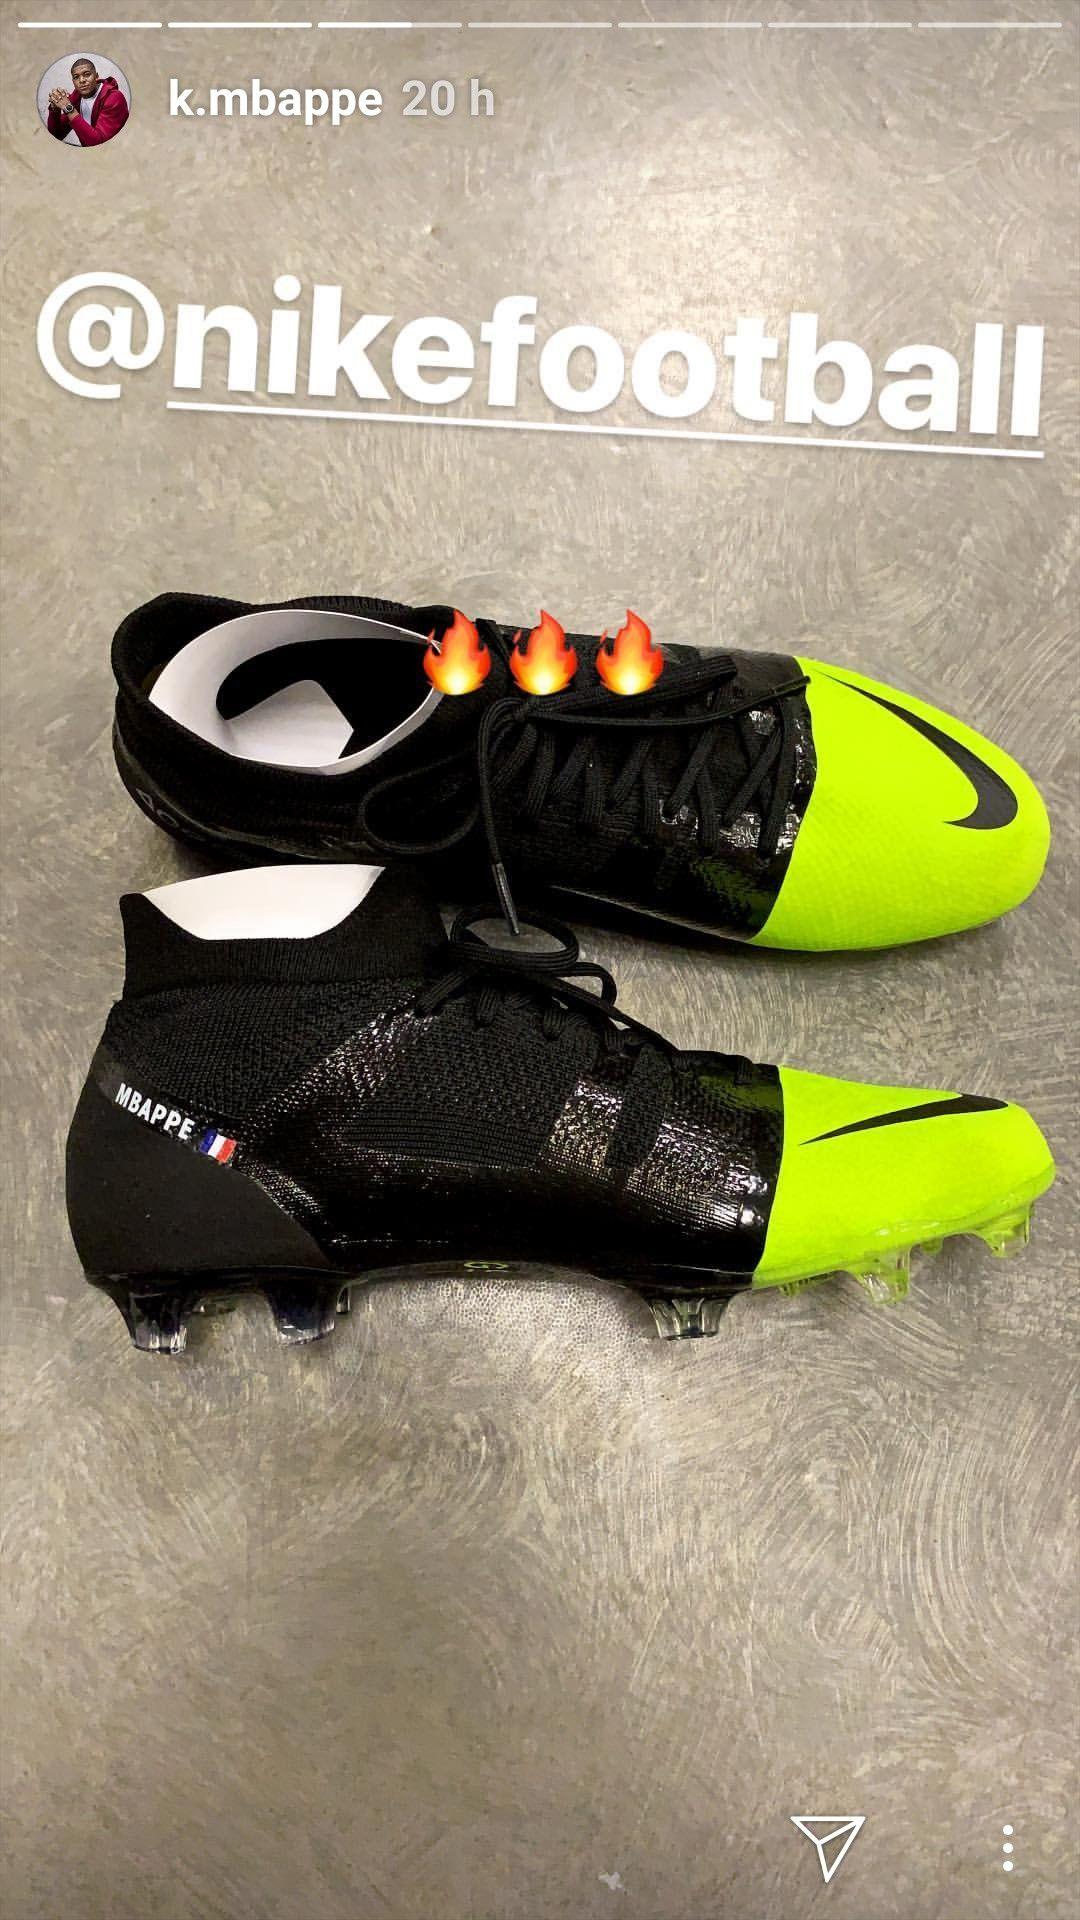 24e8c428ac3 New boot of mbappe